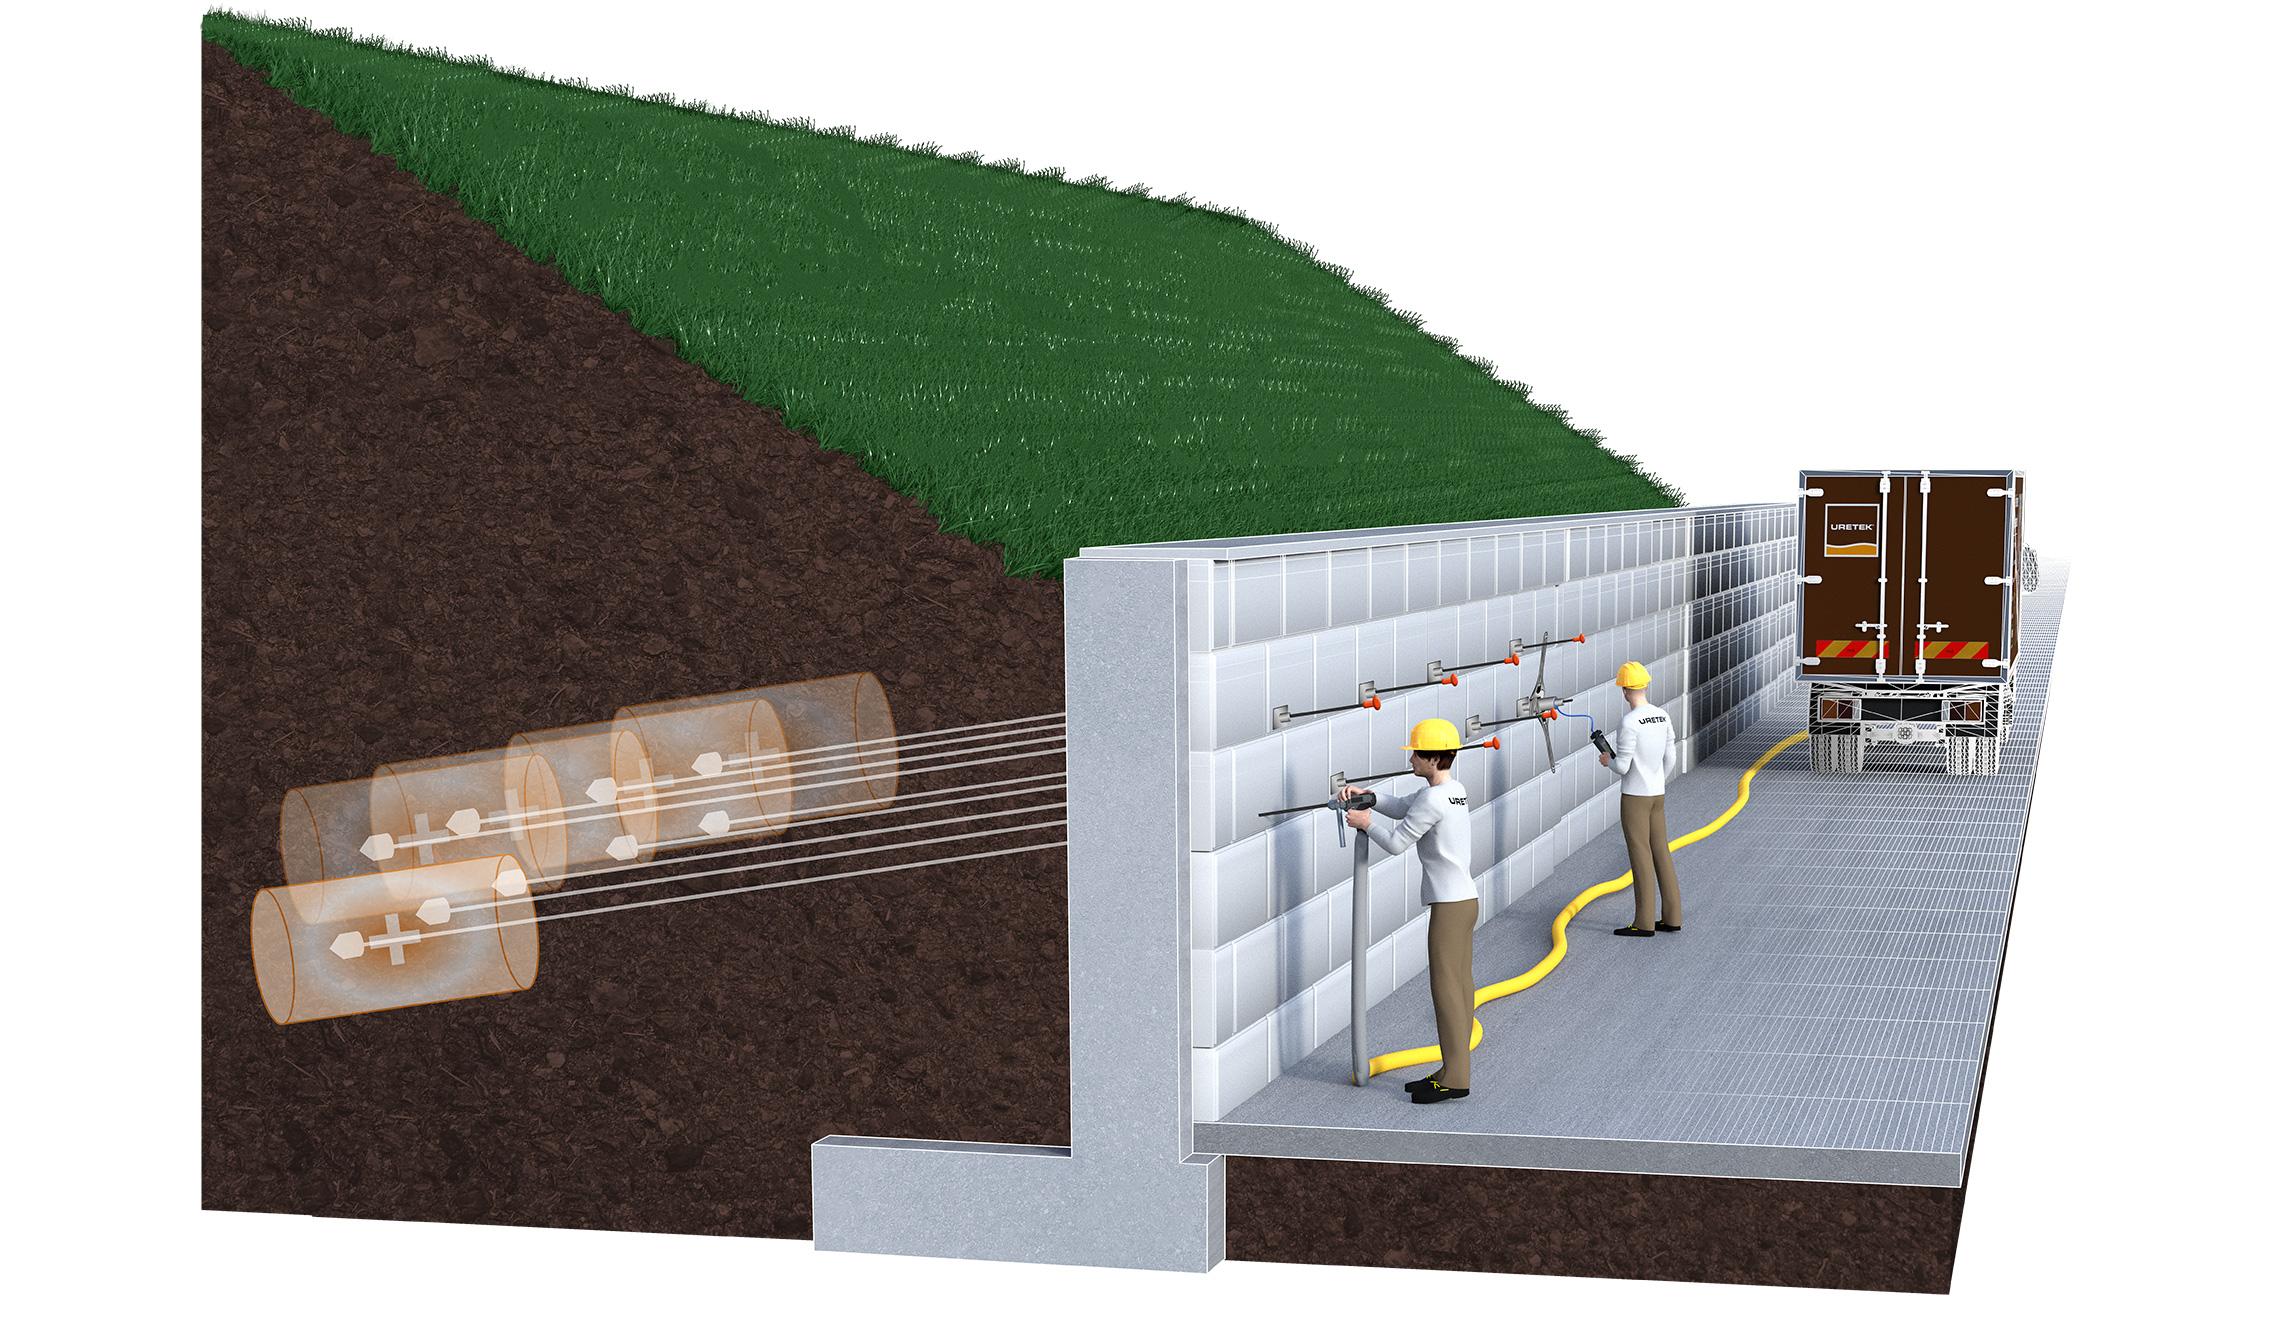 Microanchors : stabilisation & ancrage d'ouvrages contre terre